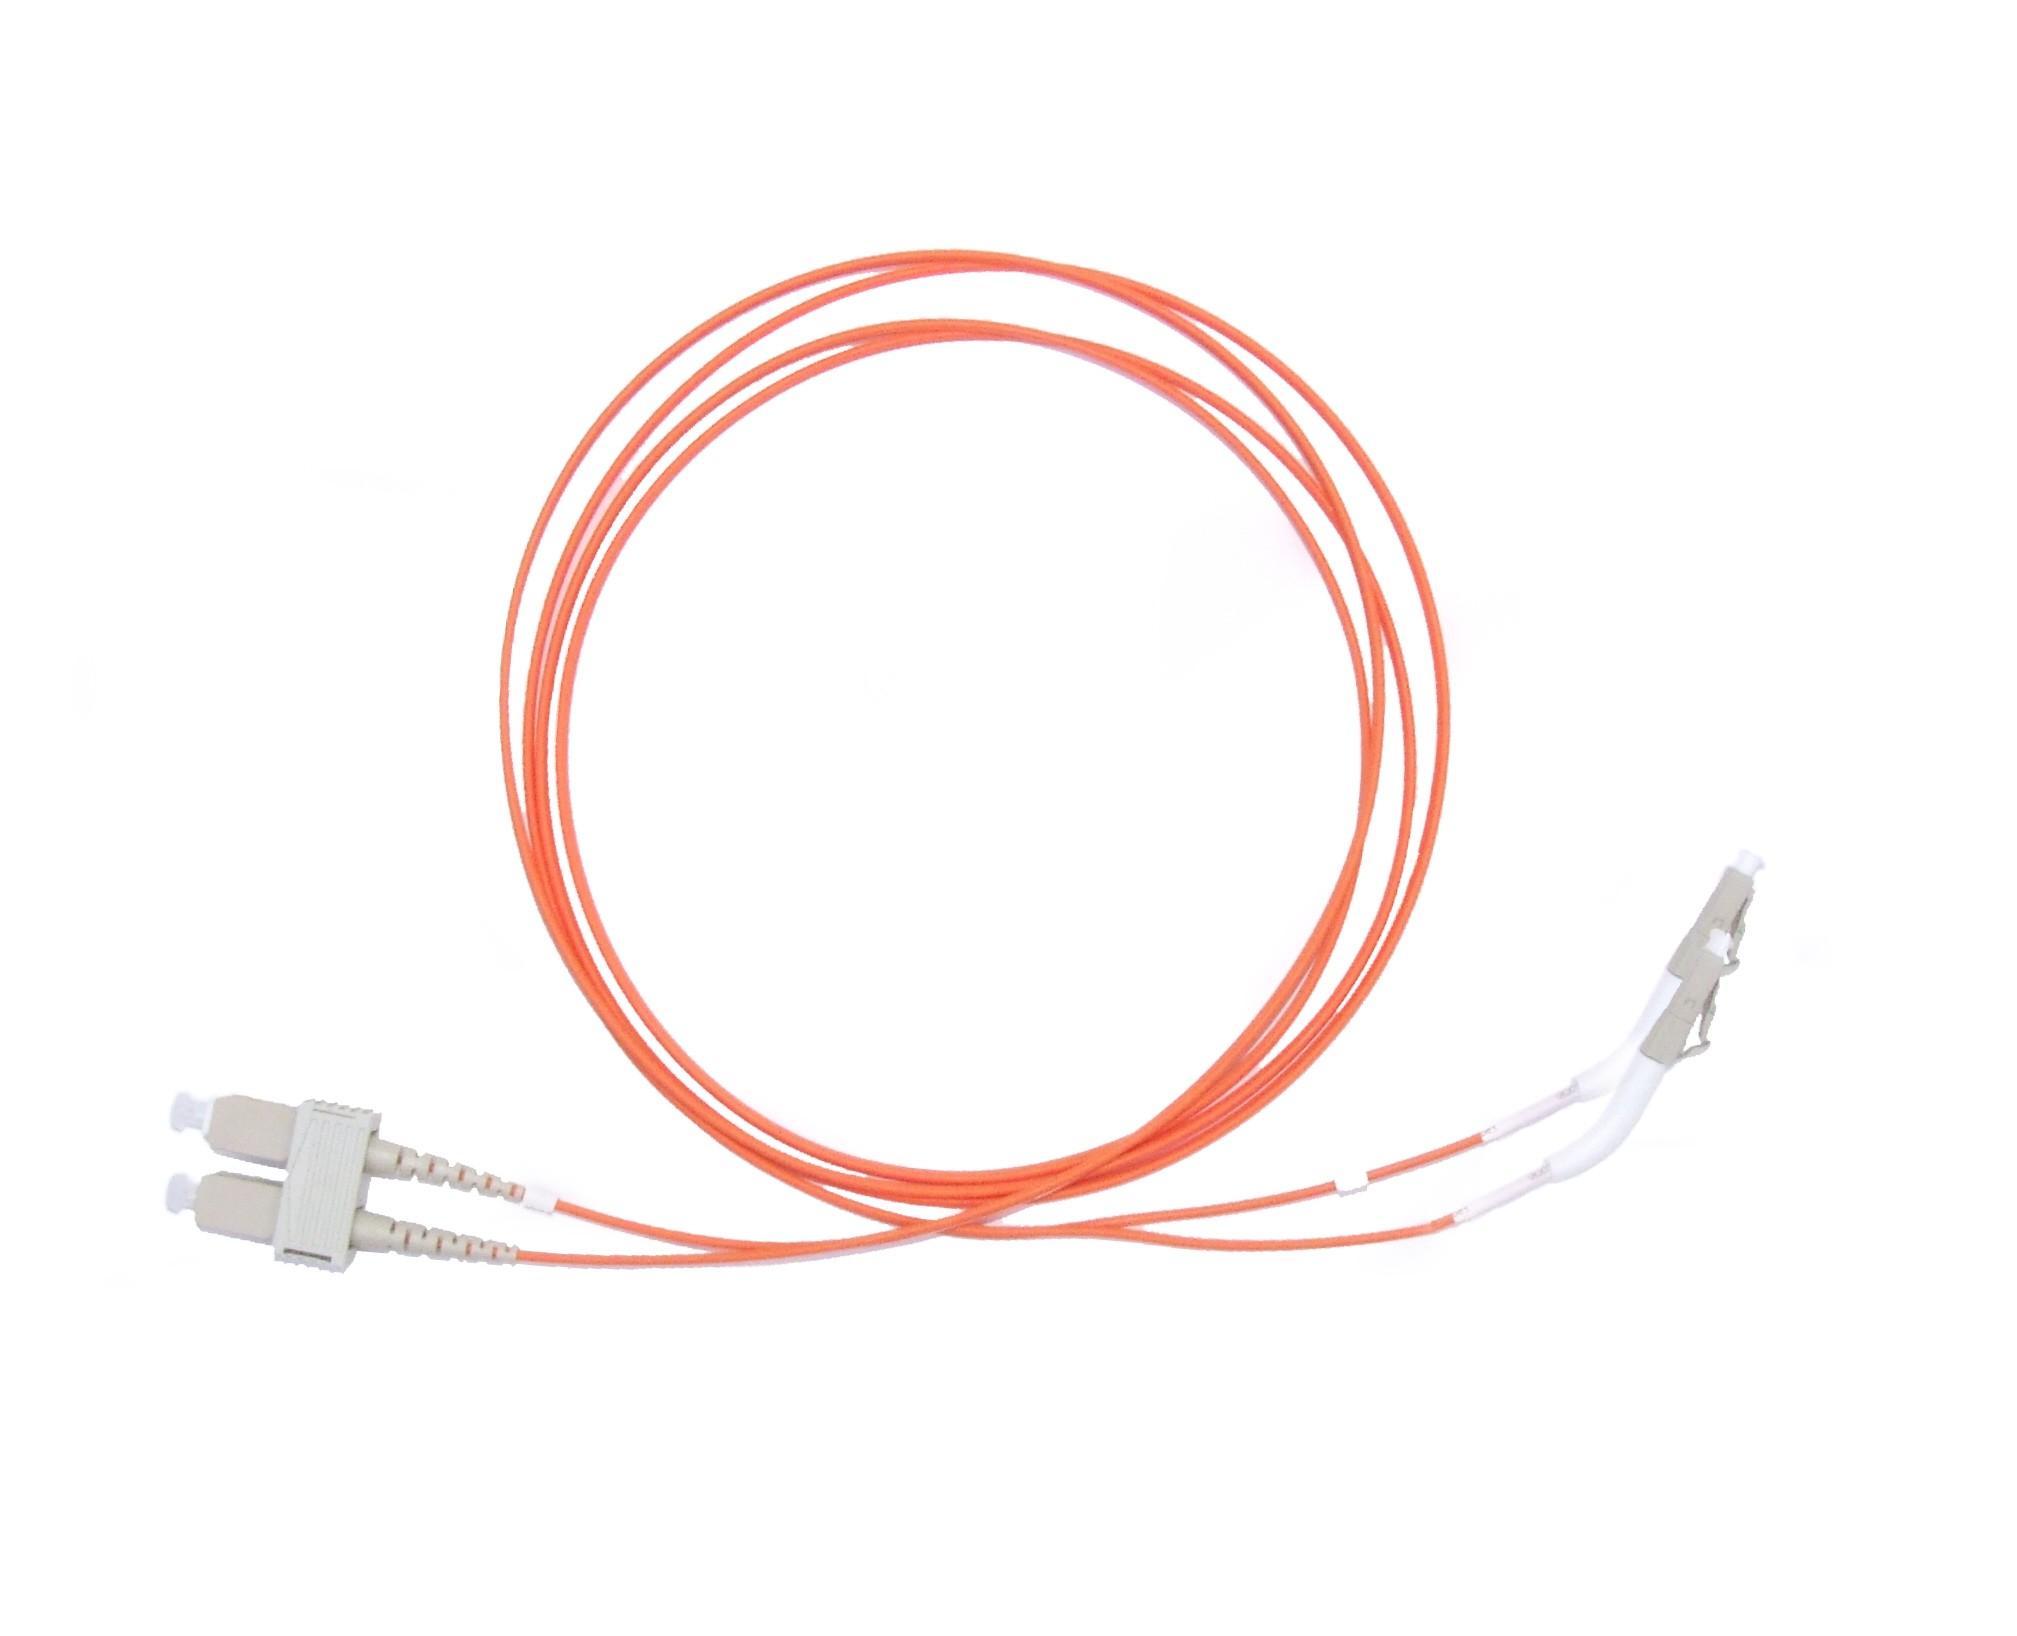 LC 45 deg boot - SC Multimode fibre patch lead 62.5/125 OM1 Duplex 5m